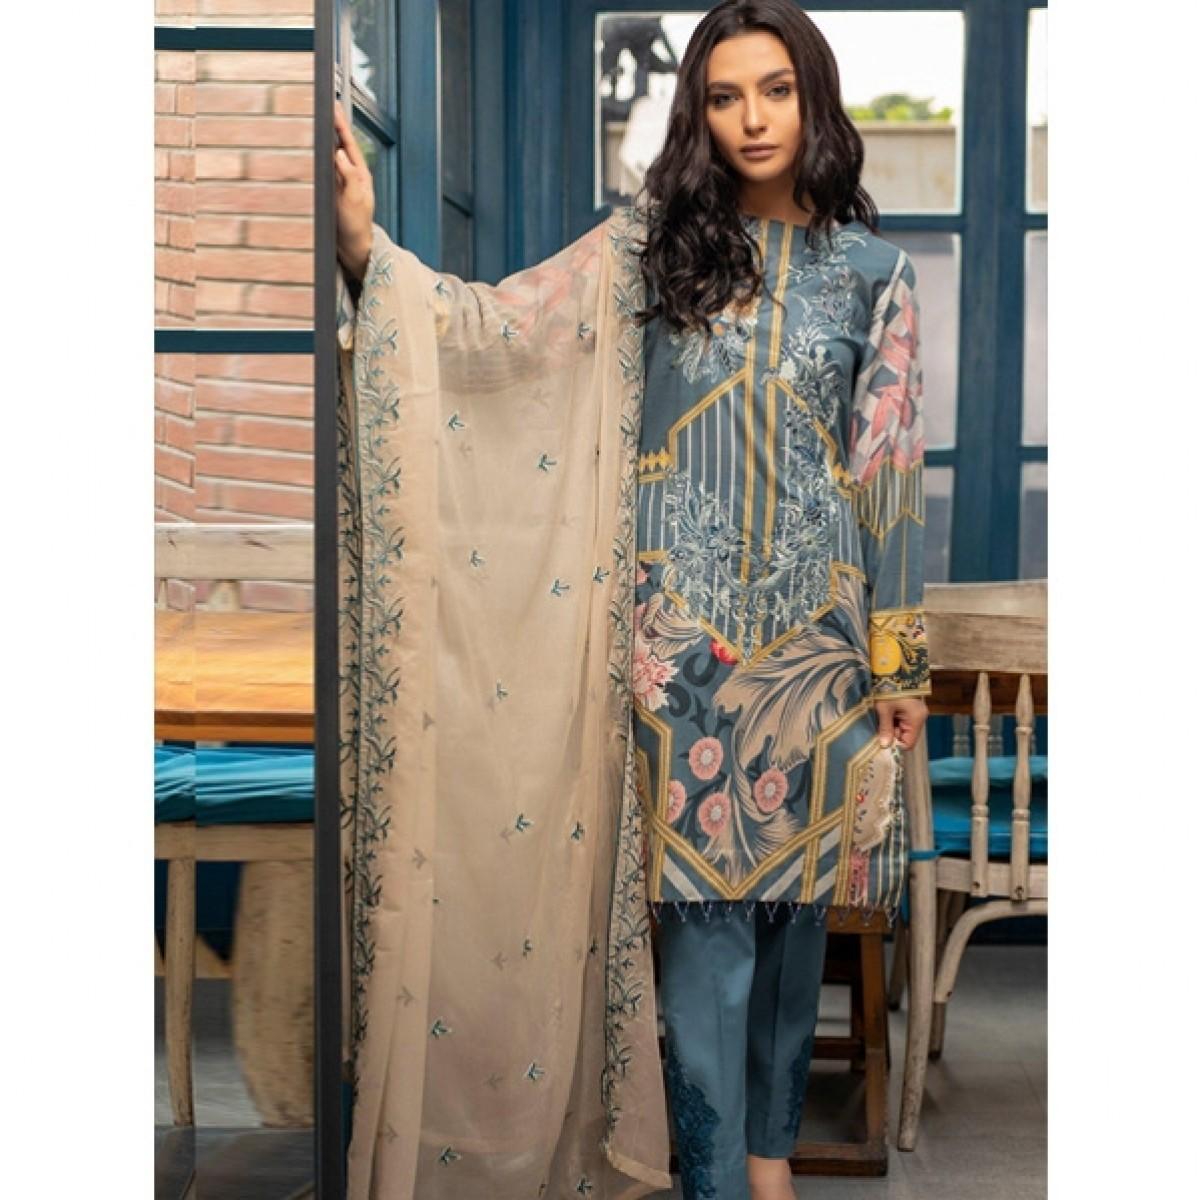 6b3e00eca1 Salitex Shades Summer 2019 3 Piece Price in Pakistan | Buy Salitex Shades Summer  Collection 2019 (WK-266A) | iShopping.pk